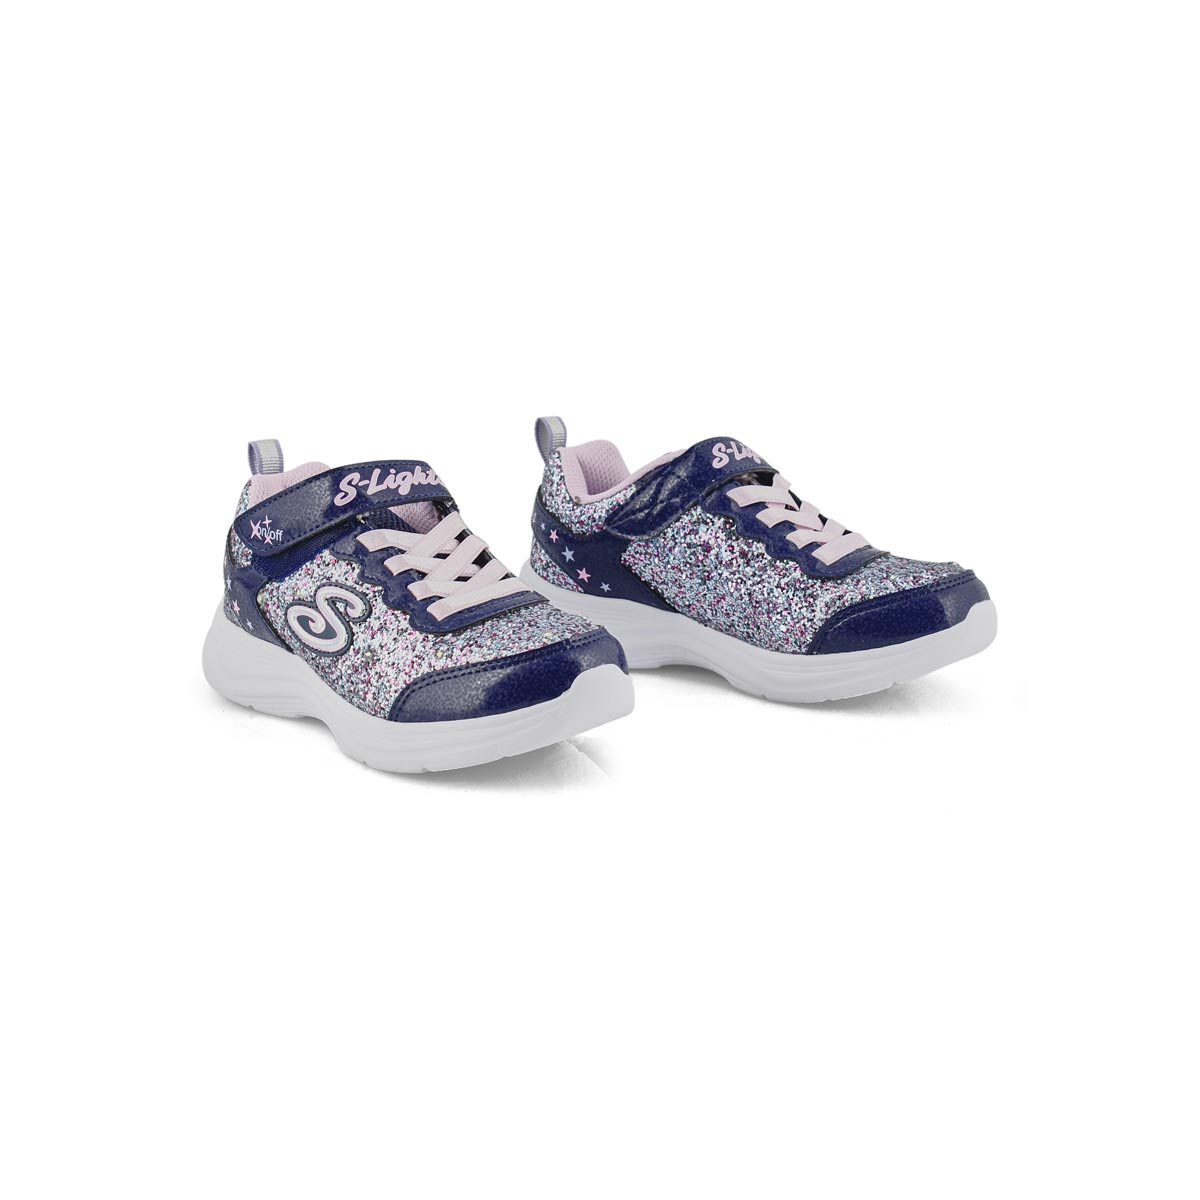 Girls' Glimmer Kicks Sneakers - Navy/Multi